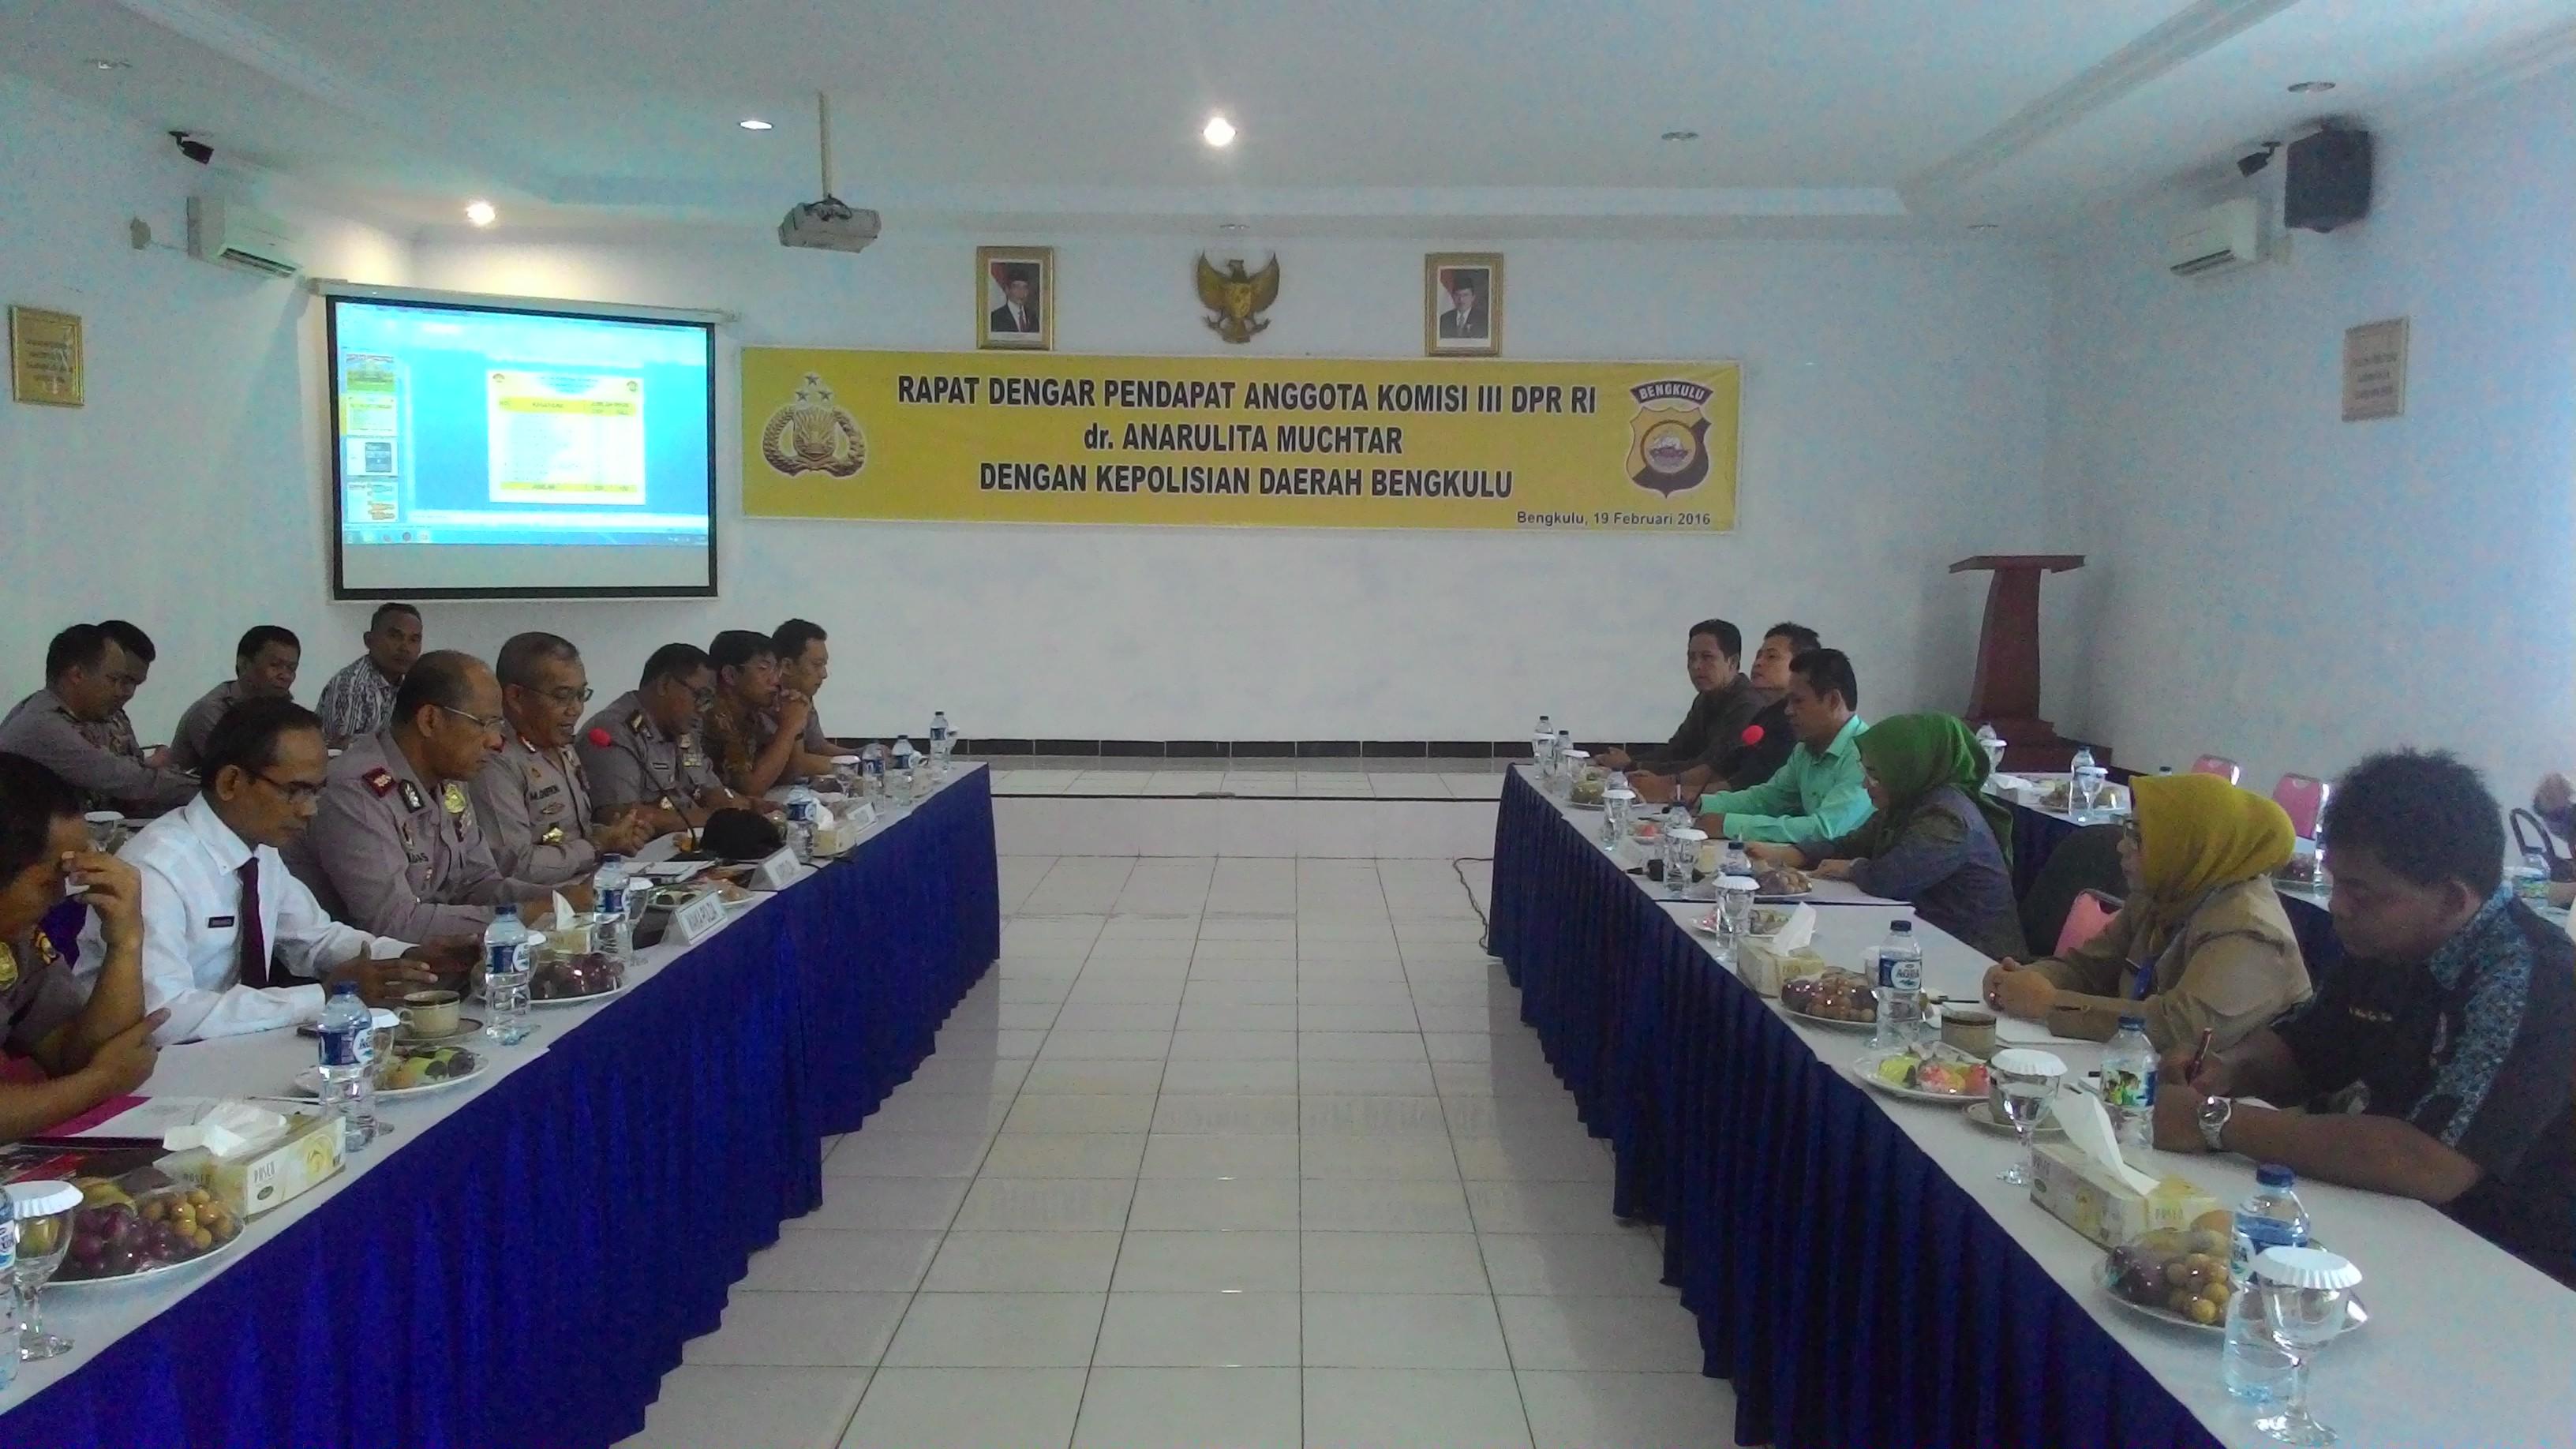 RDP Polda Bengkulu dengan Komisi III DPR RI